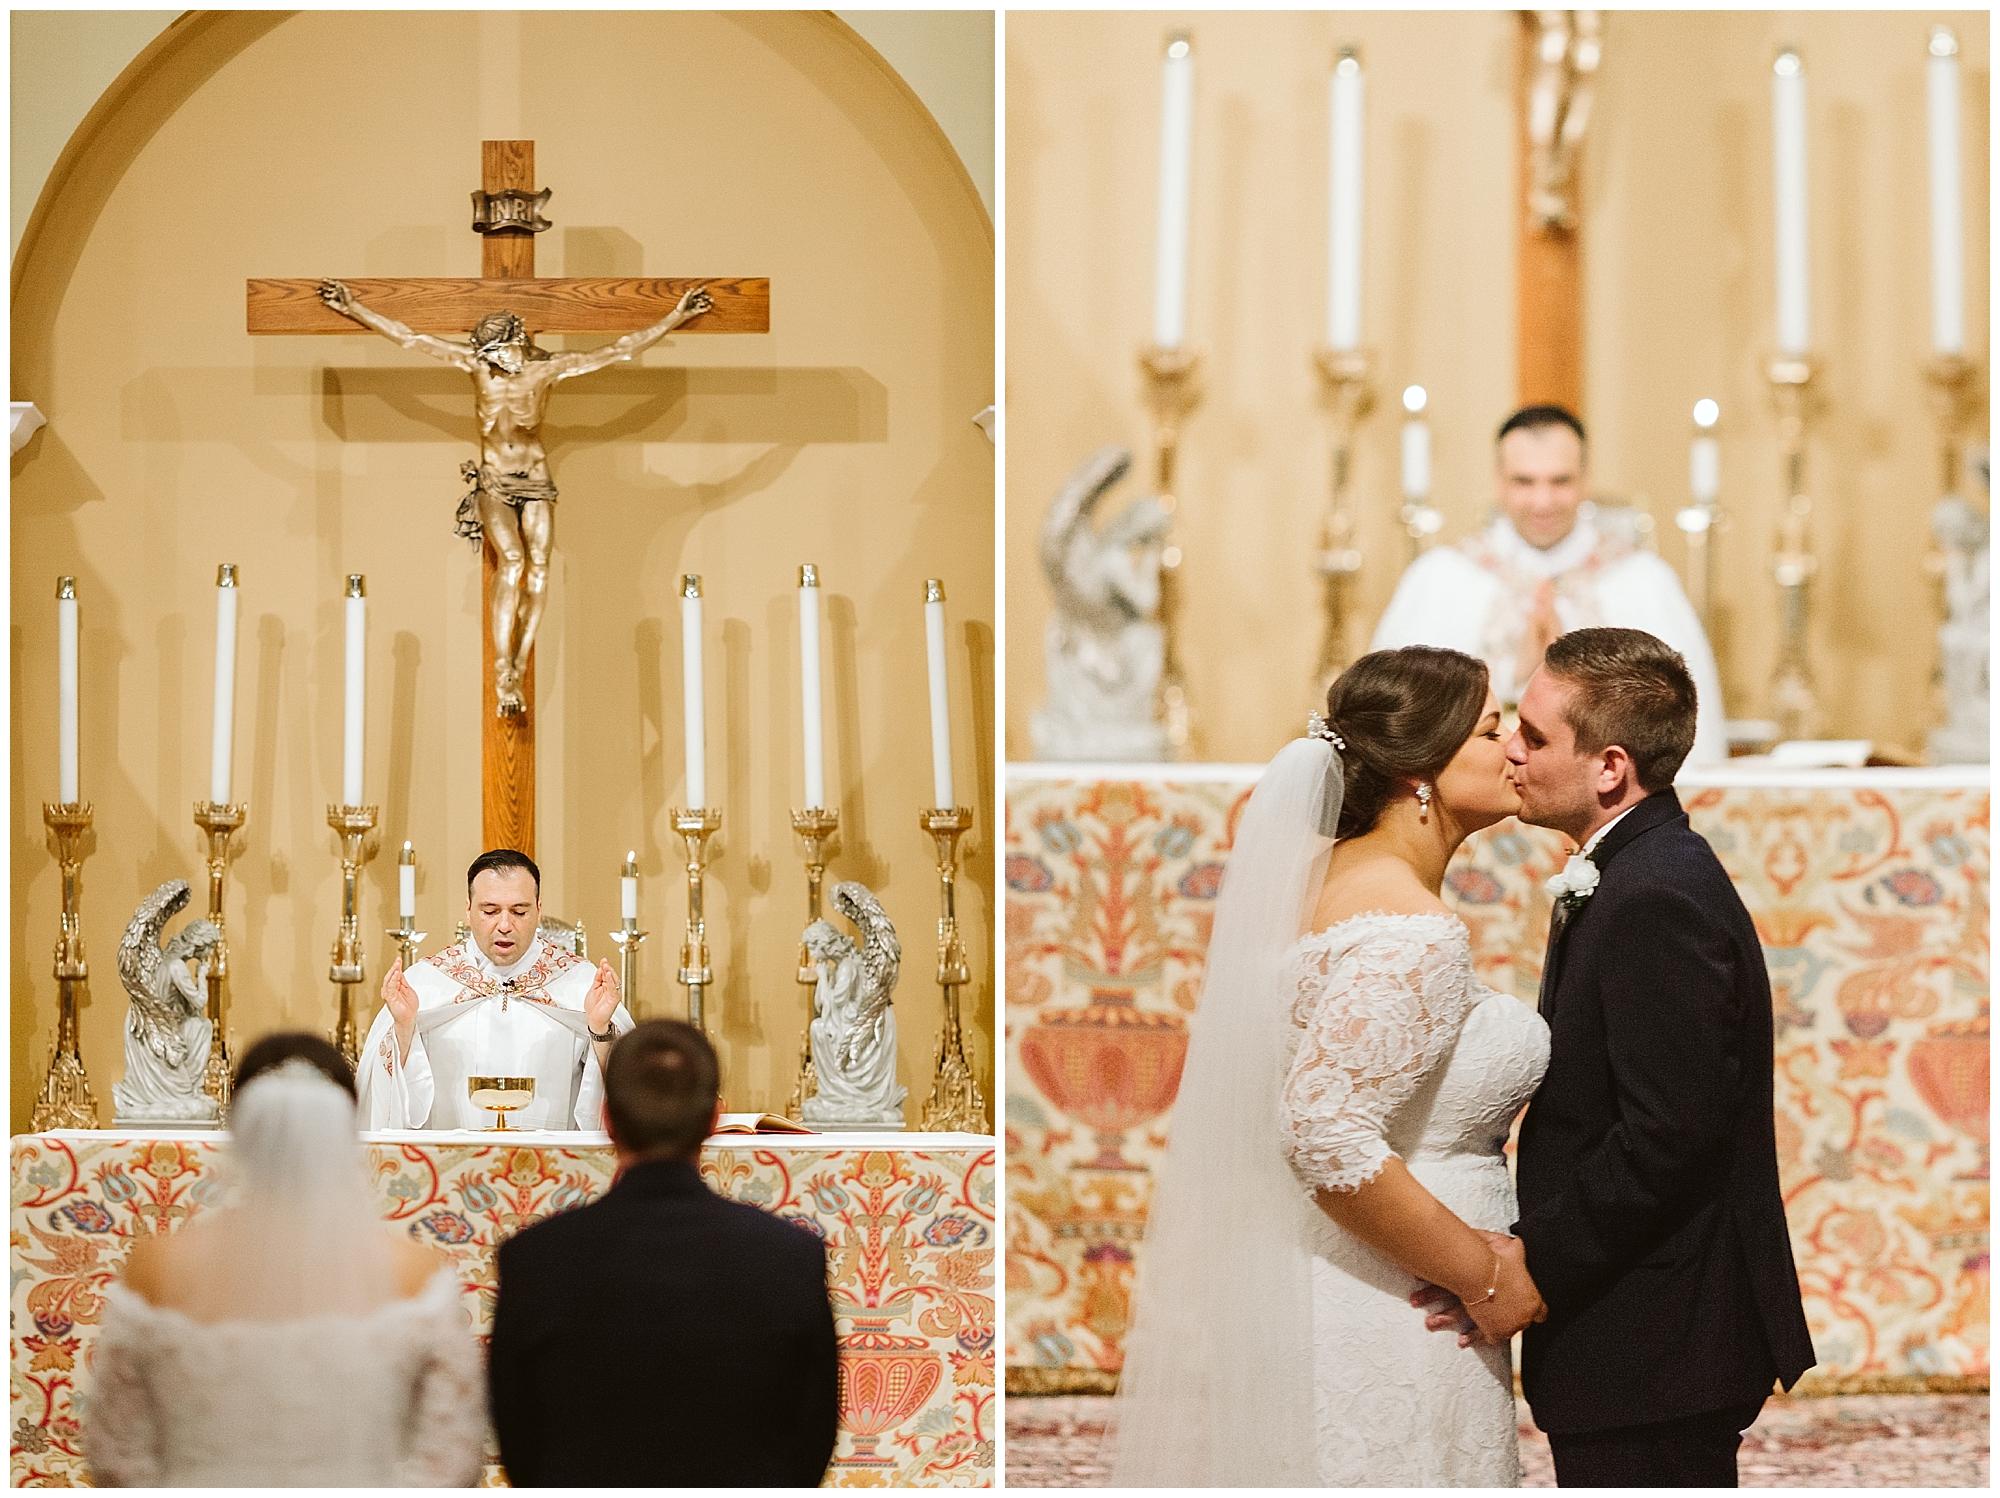 Oaks-at-salem-wedding-apex-photography-1-8.jpg